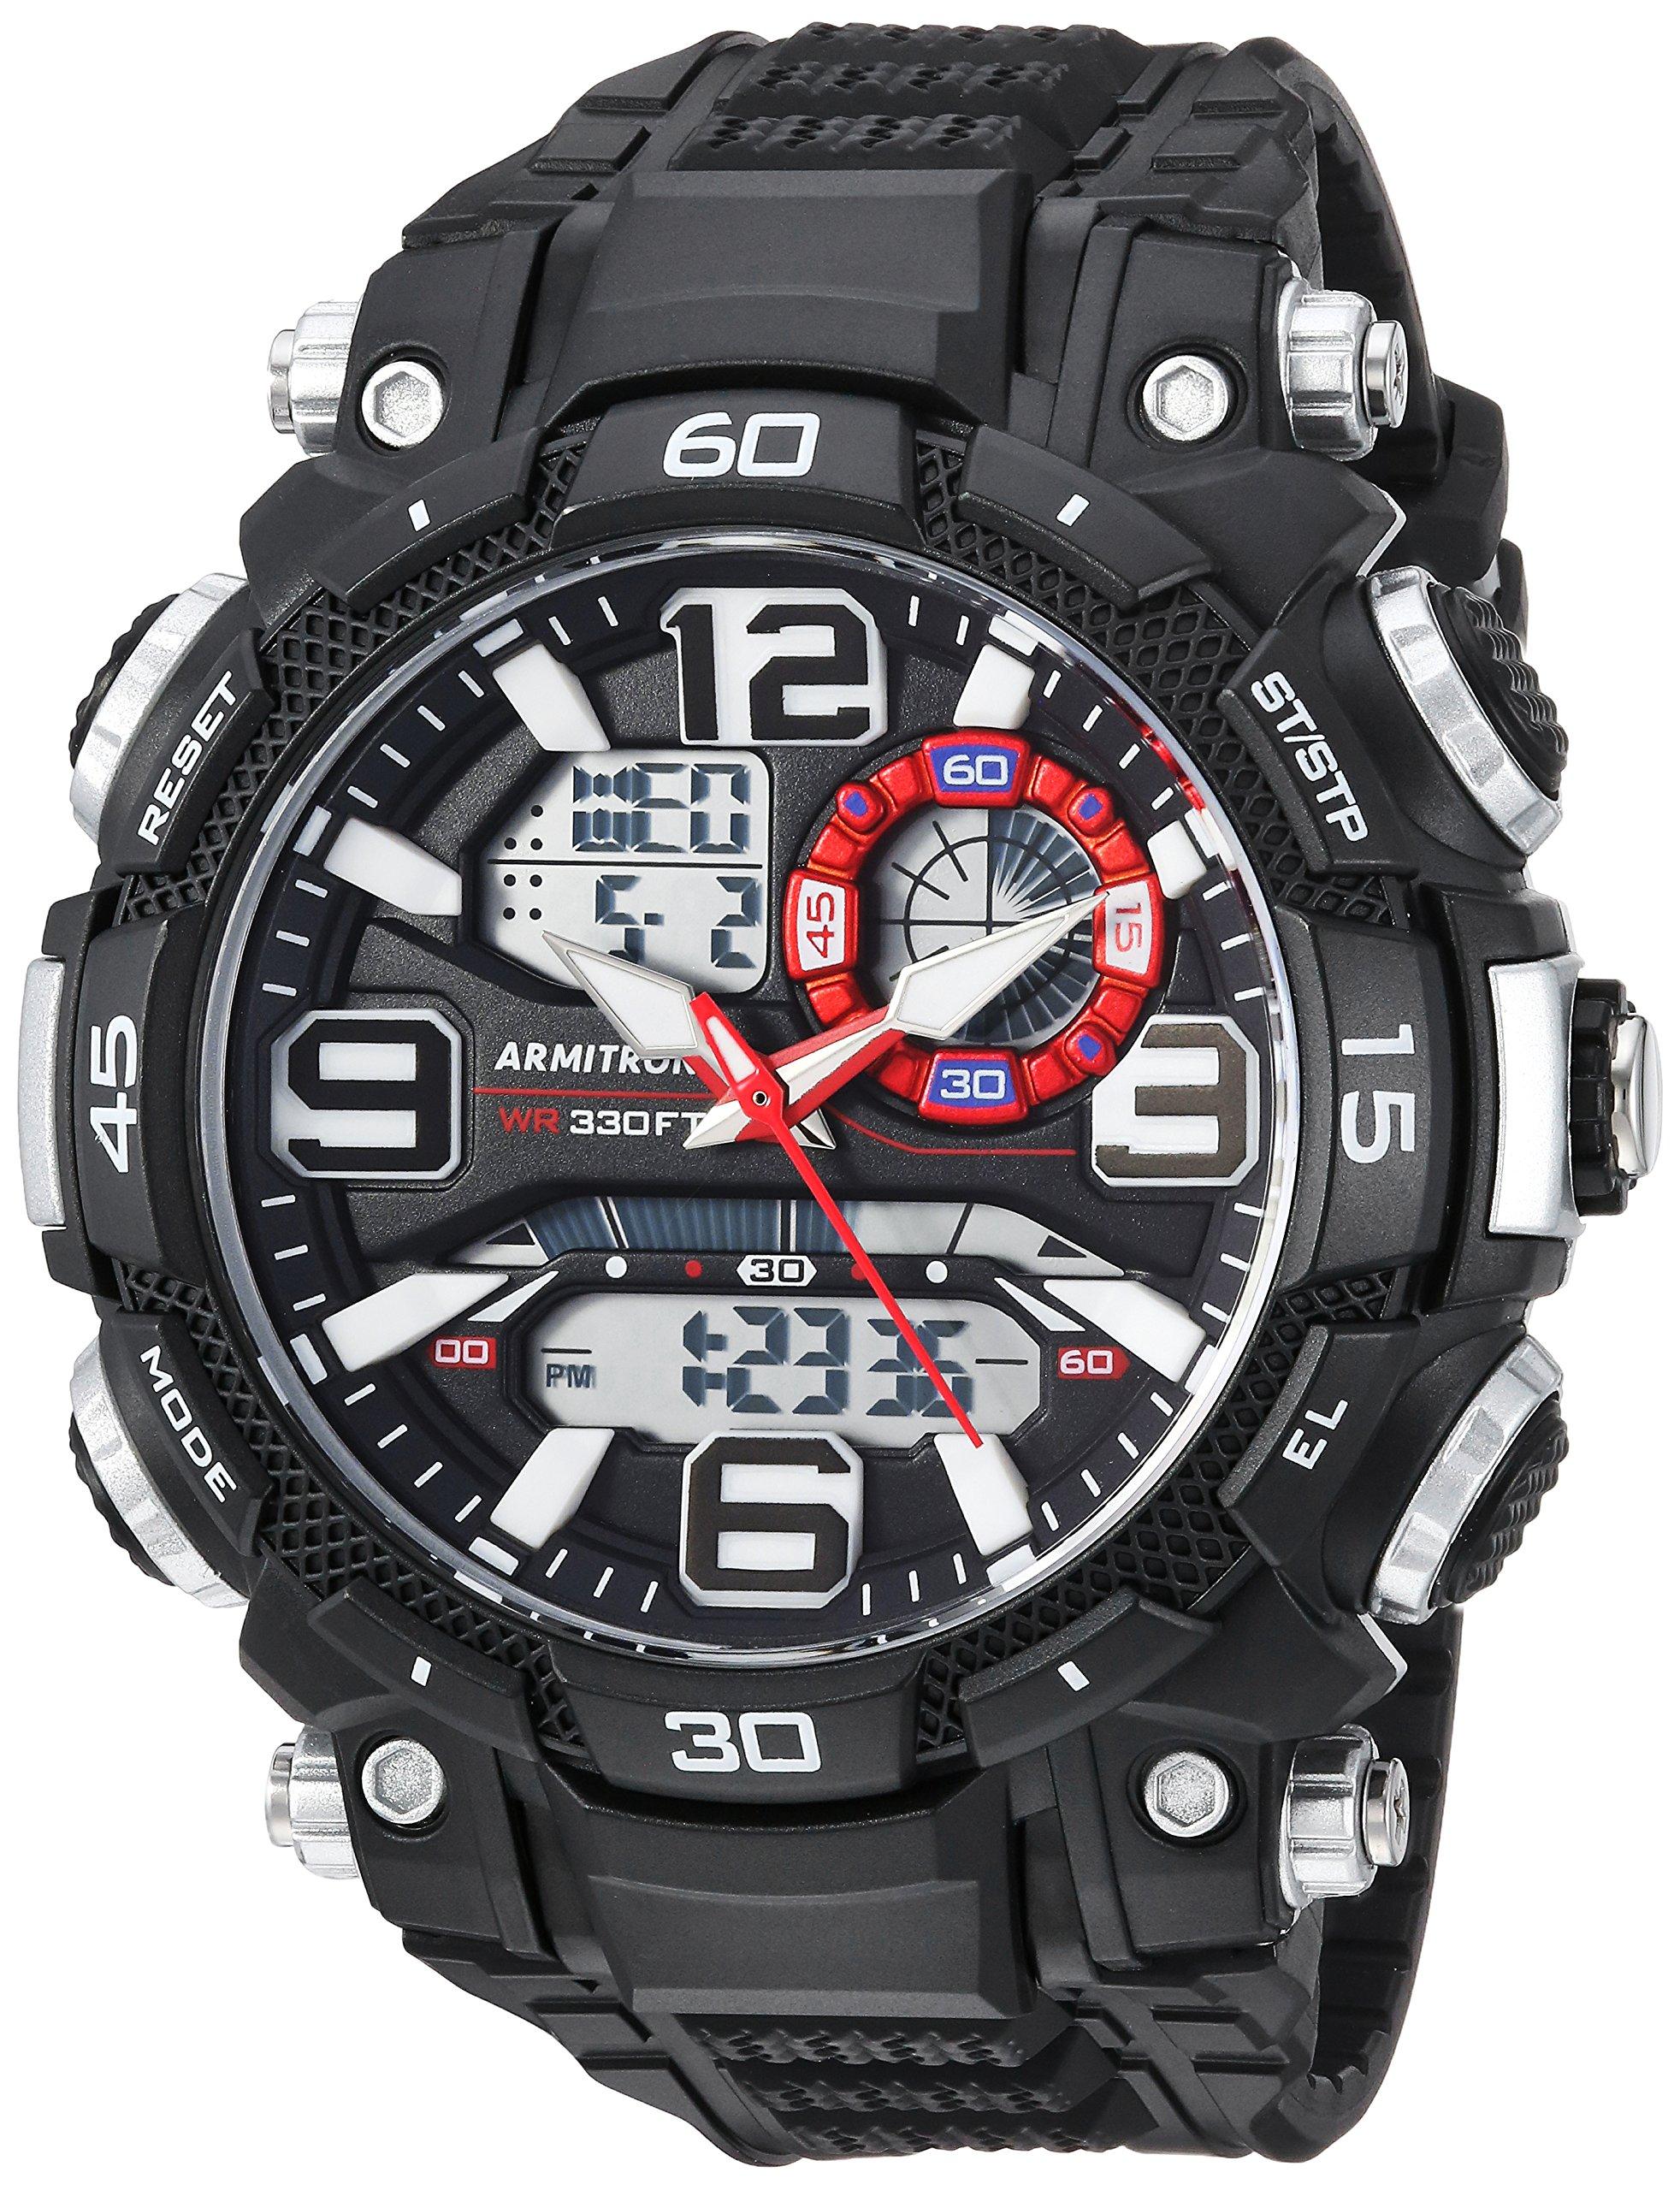 Armitron Sport 5270BLK Analog Digital Chronograph